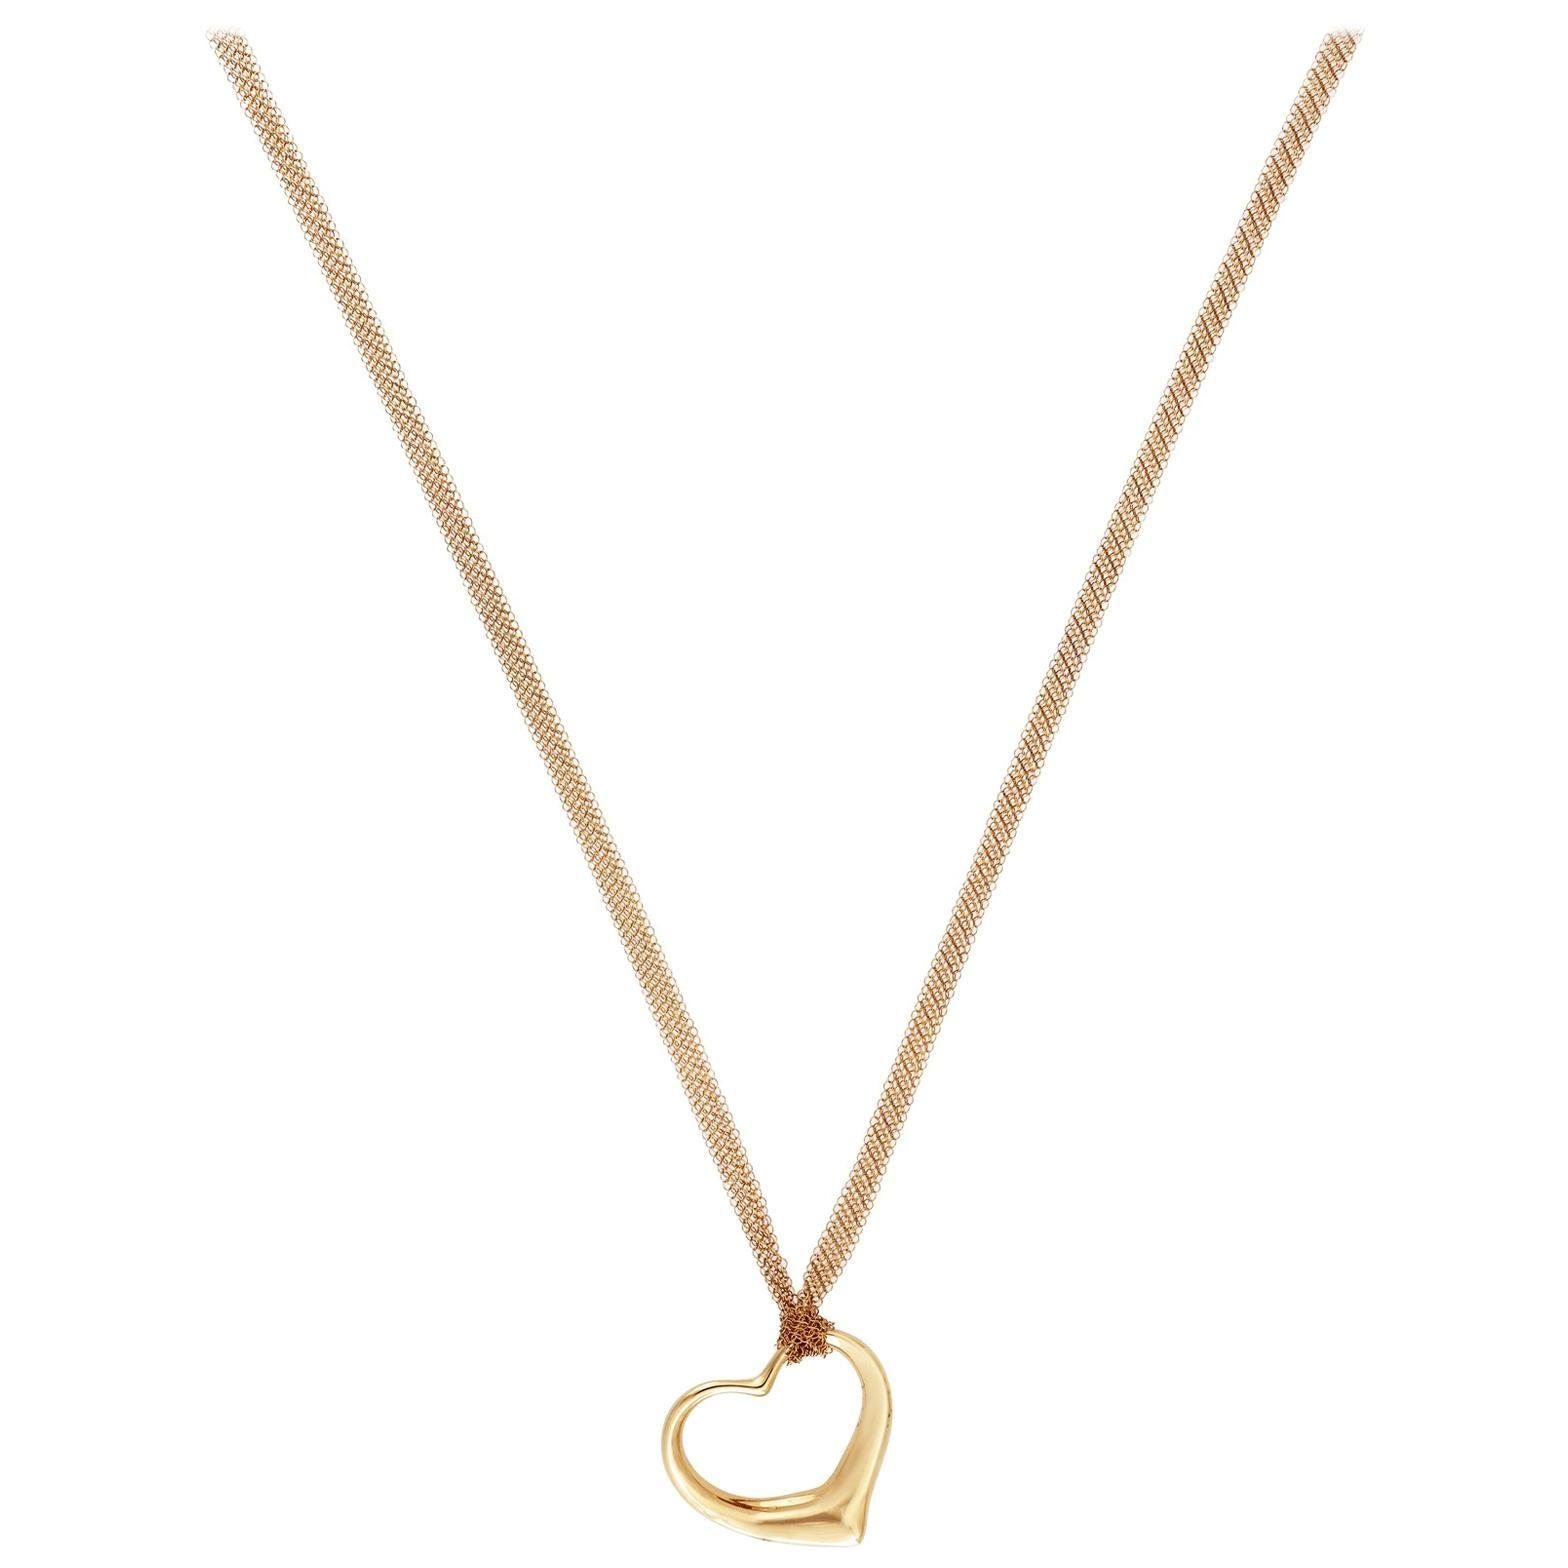 Tiffany & Co. 18 Karat Yellow Gold Elsa Perreti Open Heart Necklace